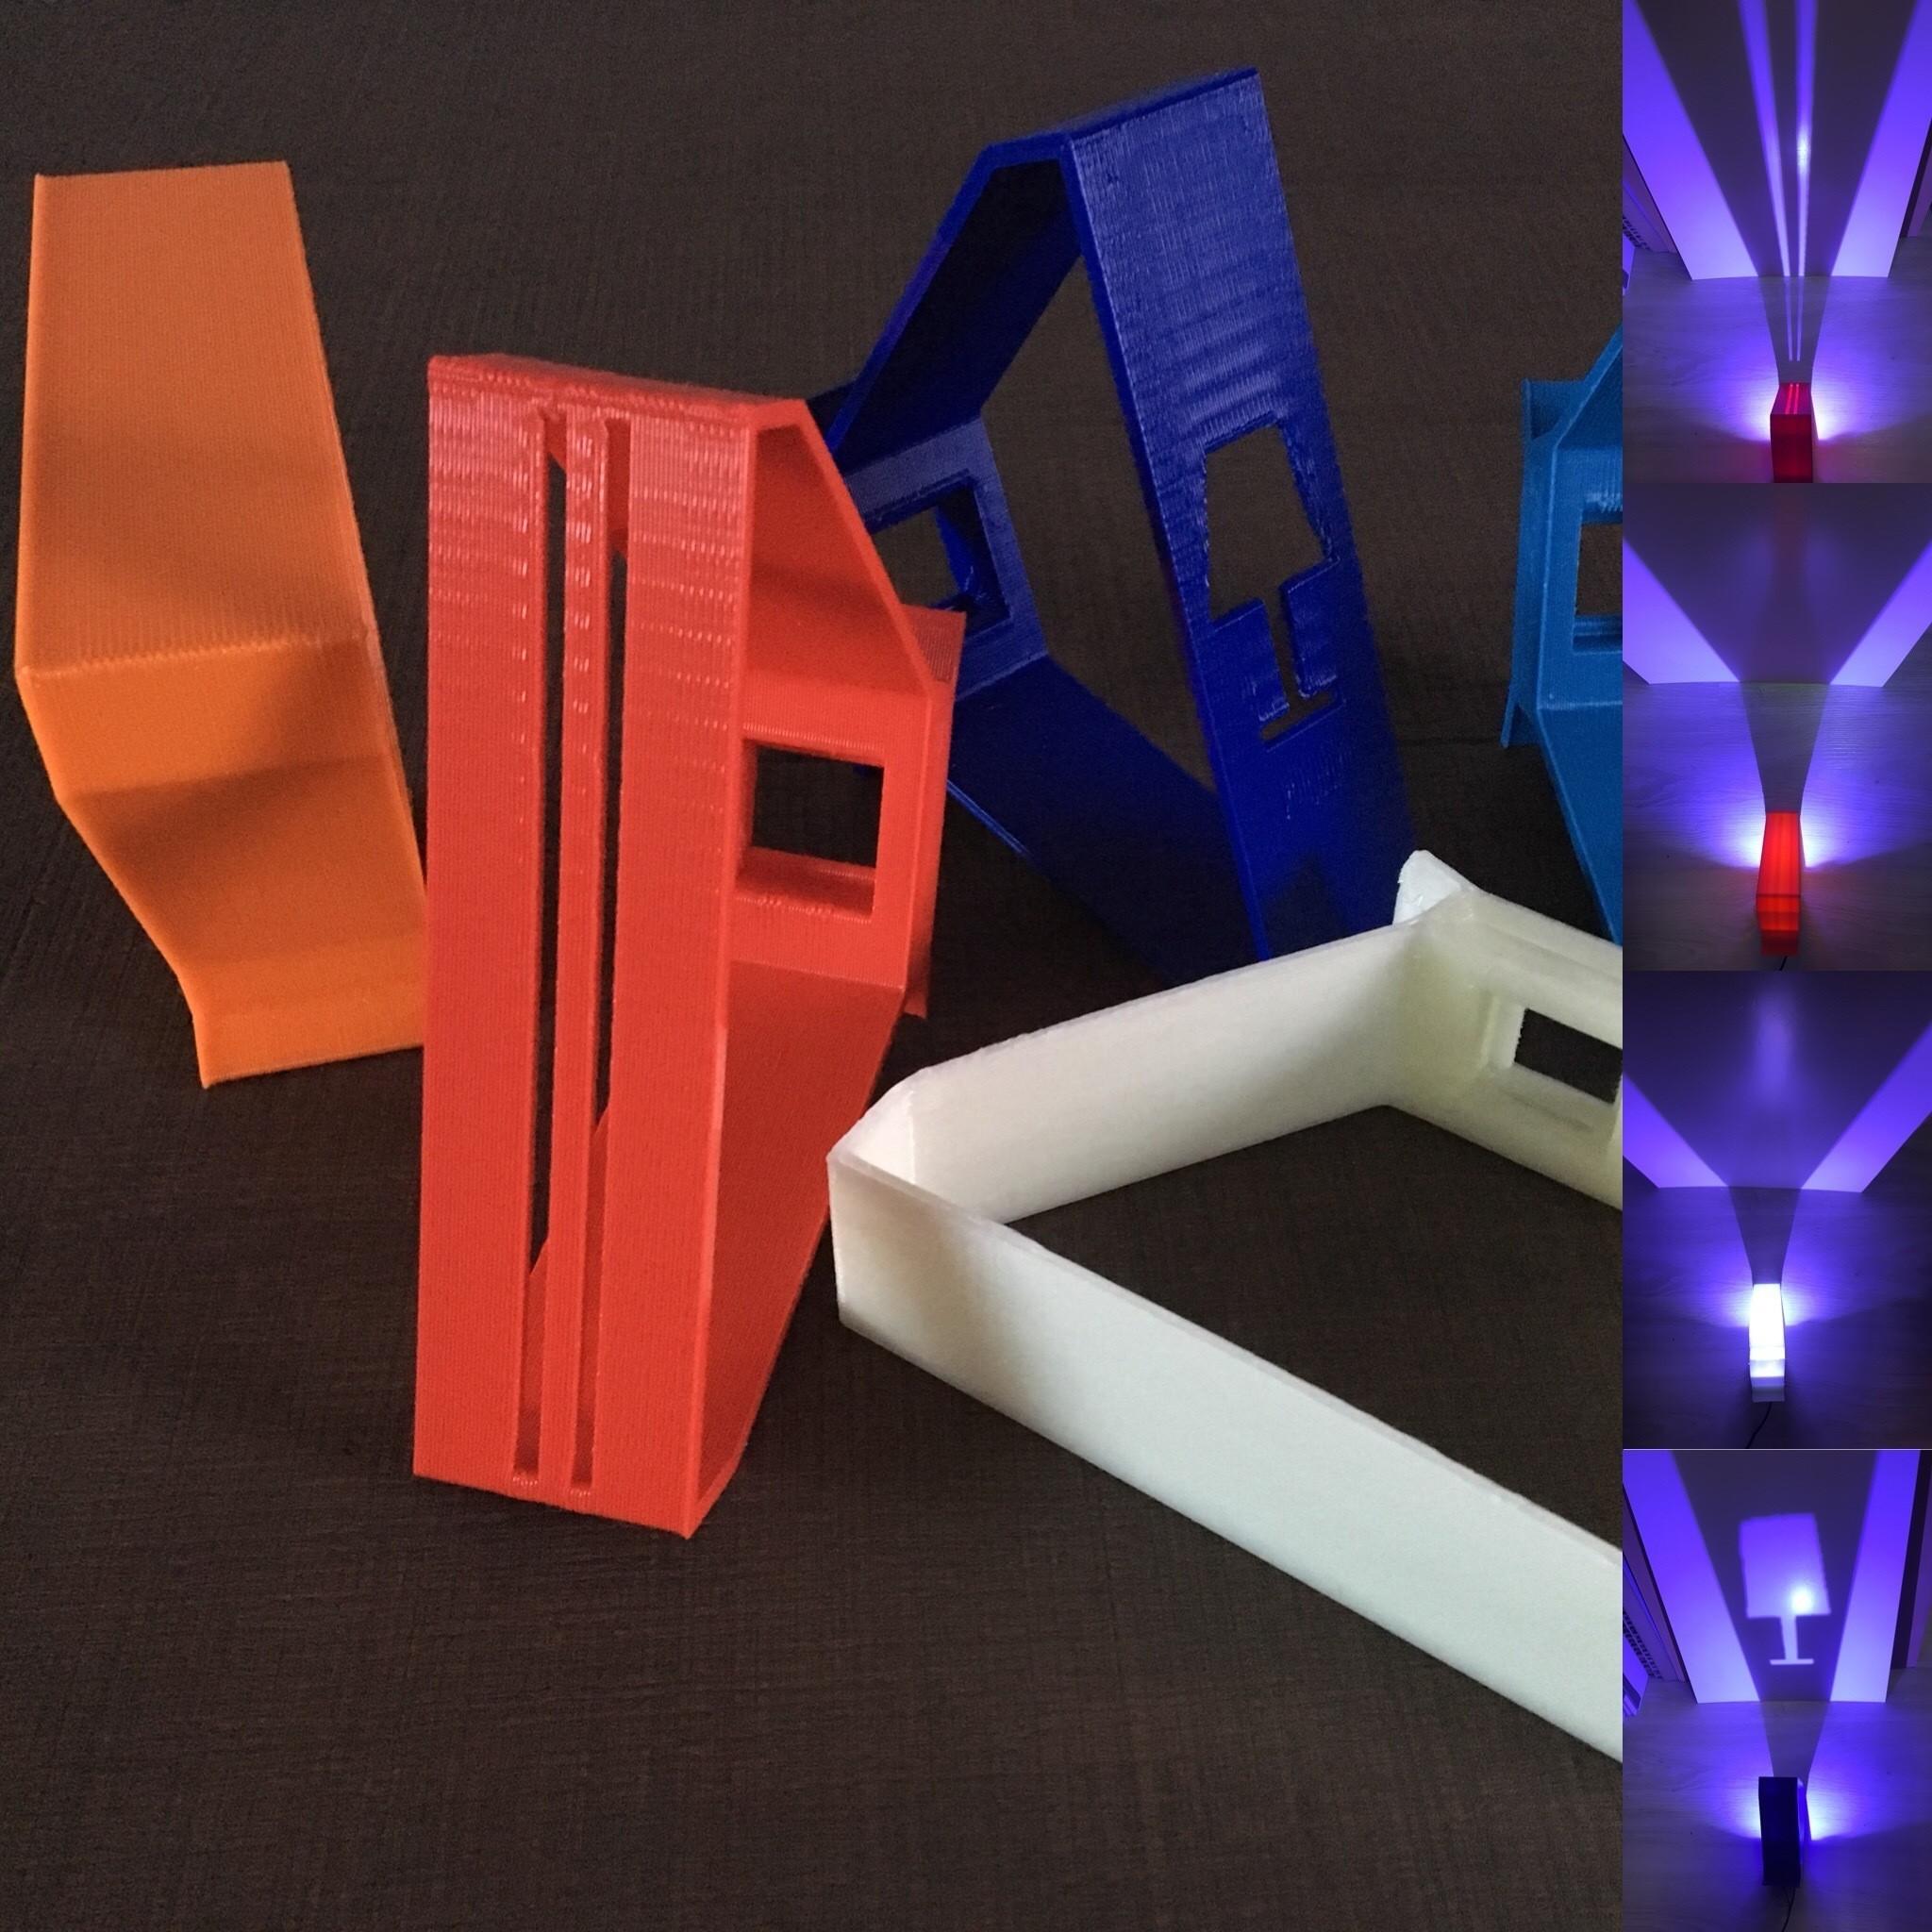 IMG_6750.jpg Download free STL file LED LIGHT • 3D printer model, Byctrldesign